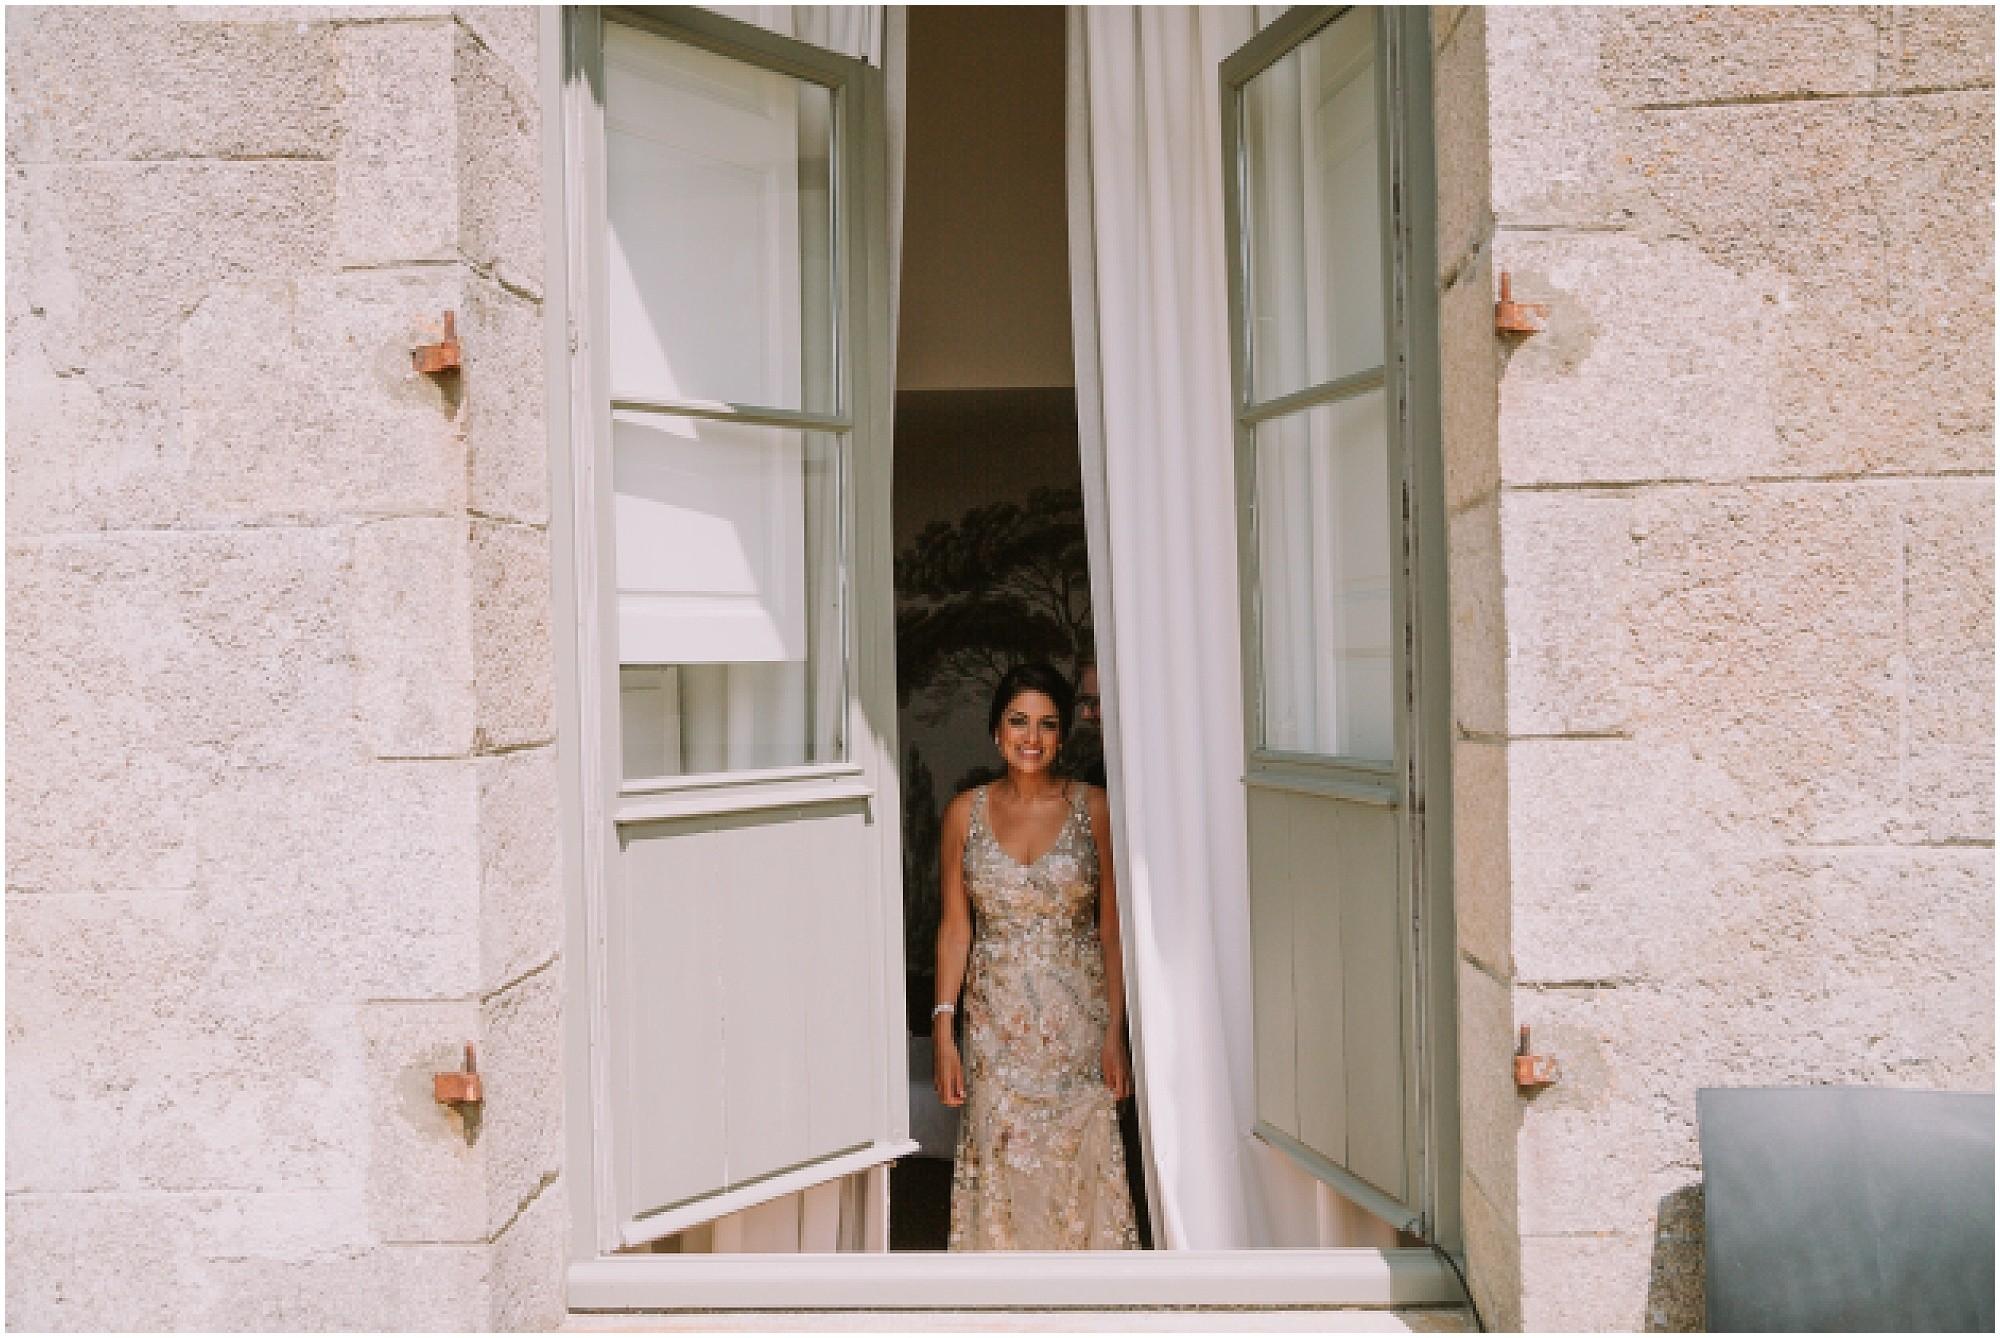 Kateryna-photos-photographer-mariage-chateau-saint-paterne-alencon-normandie-mayenne-le-mans_0020.jpg